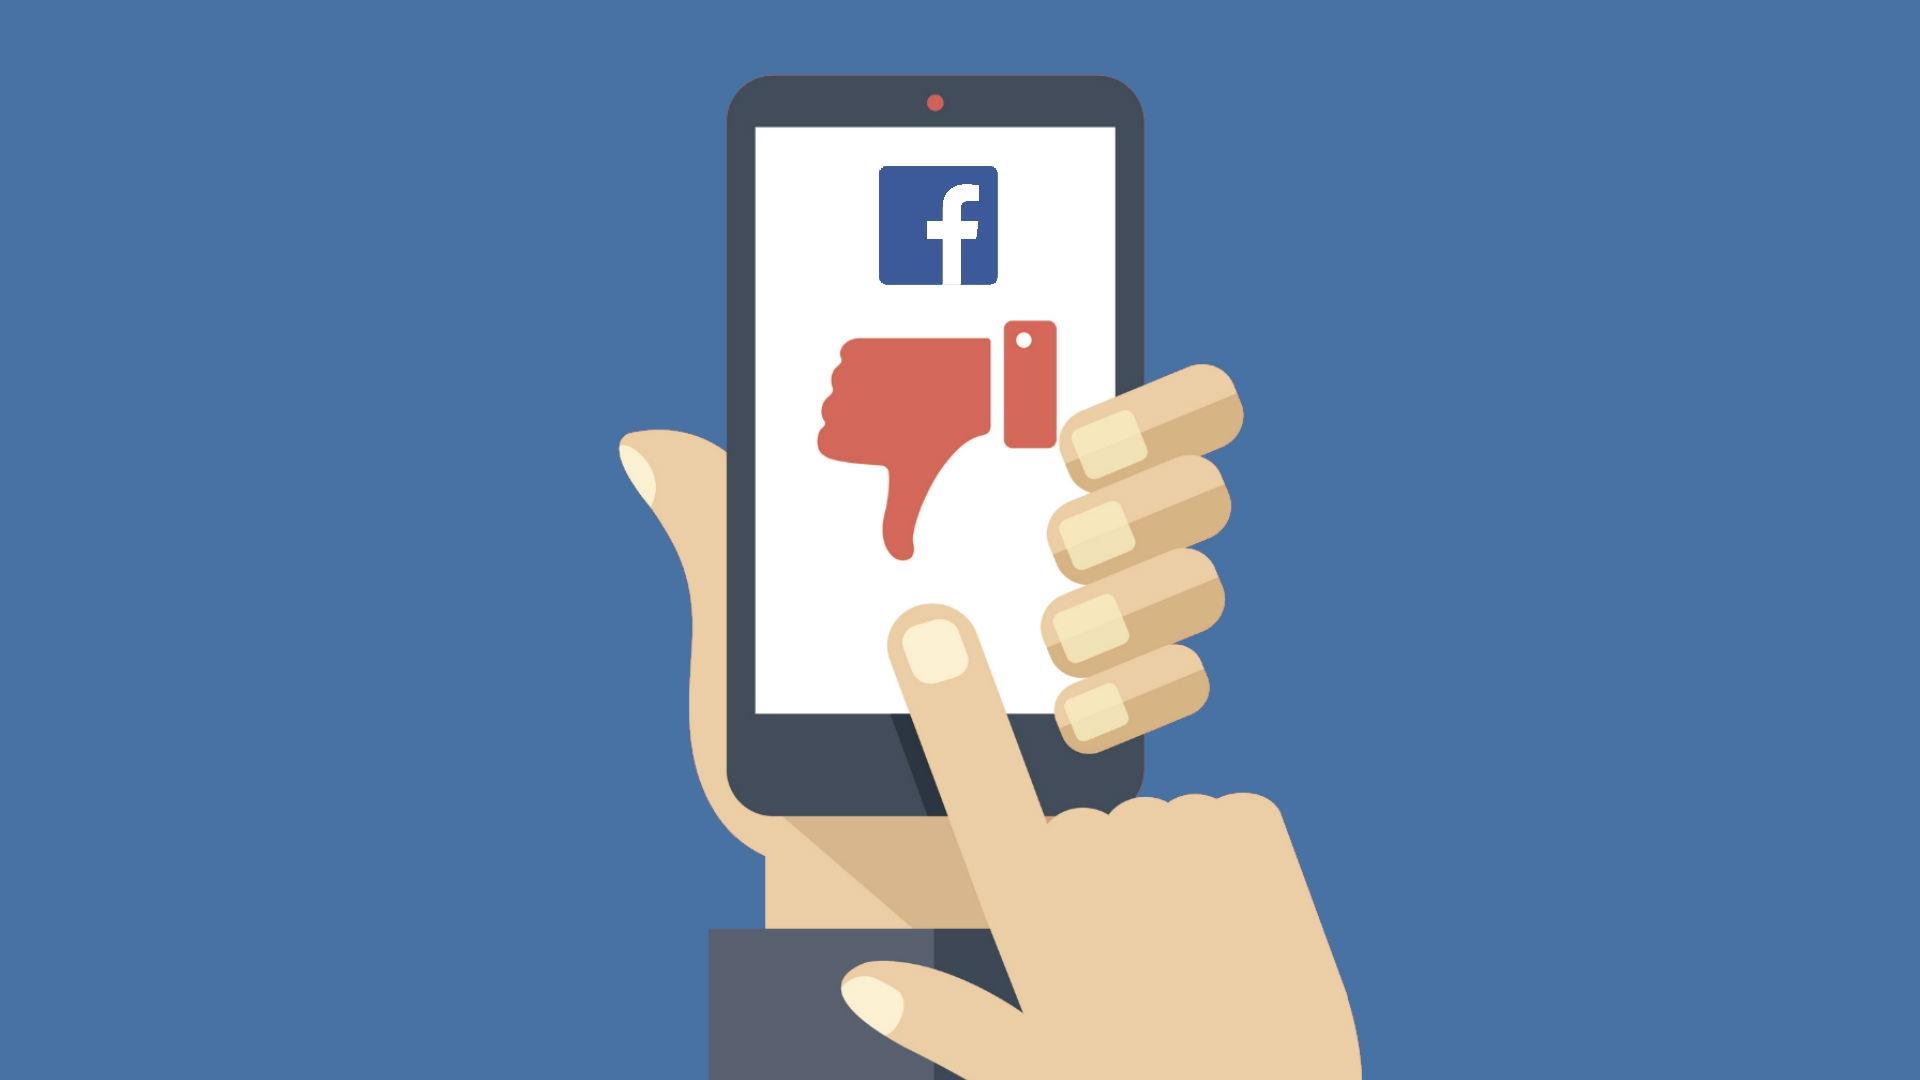 Fact-Checkers Raise Concerns Over How Facebook Defines Politicians